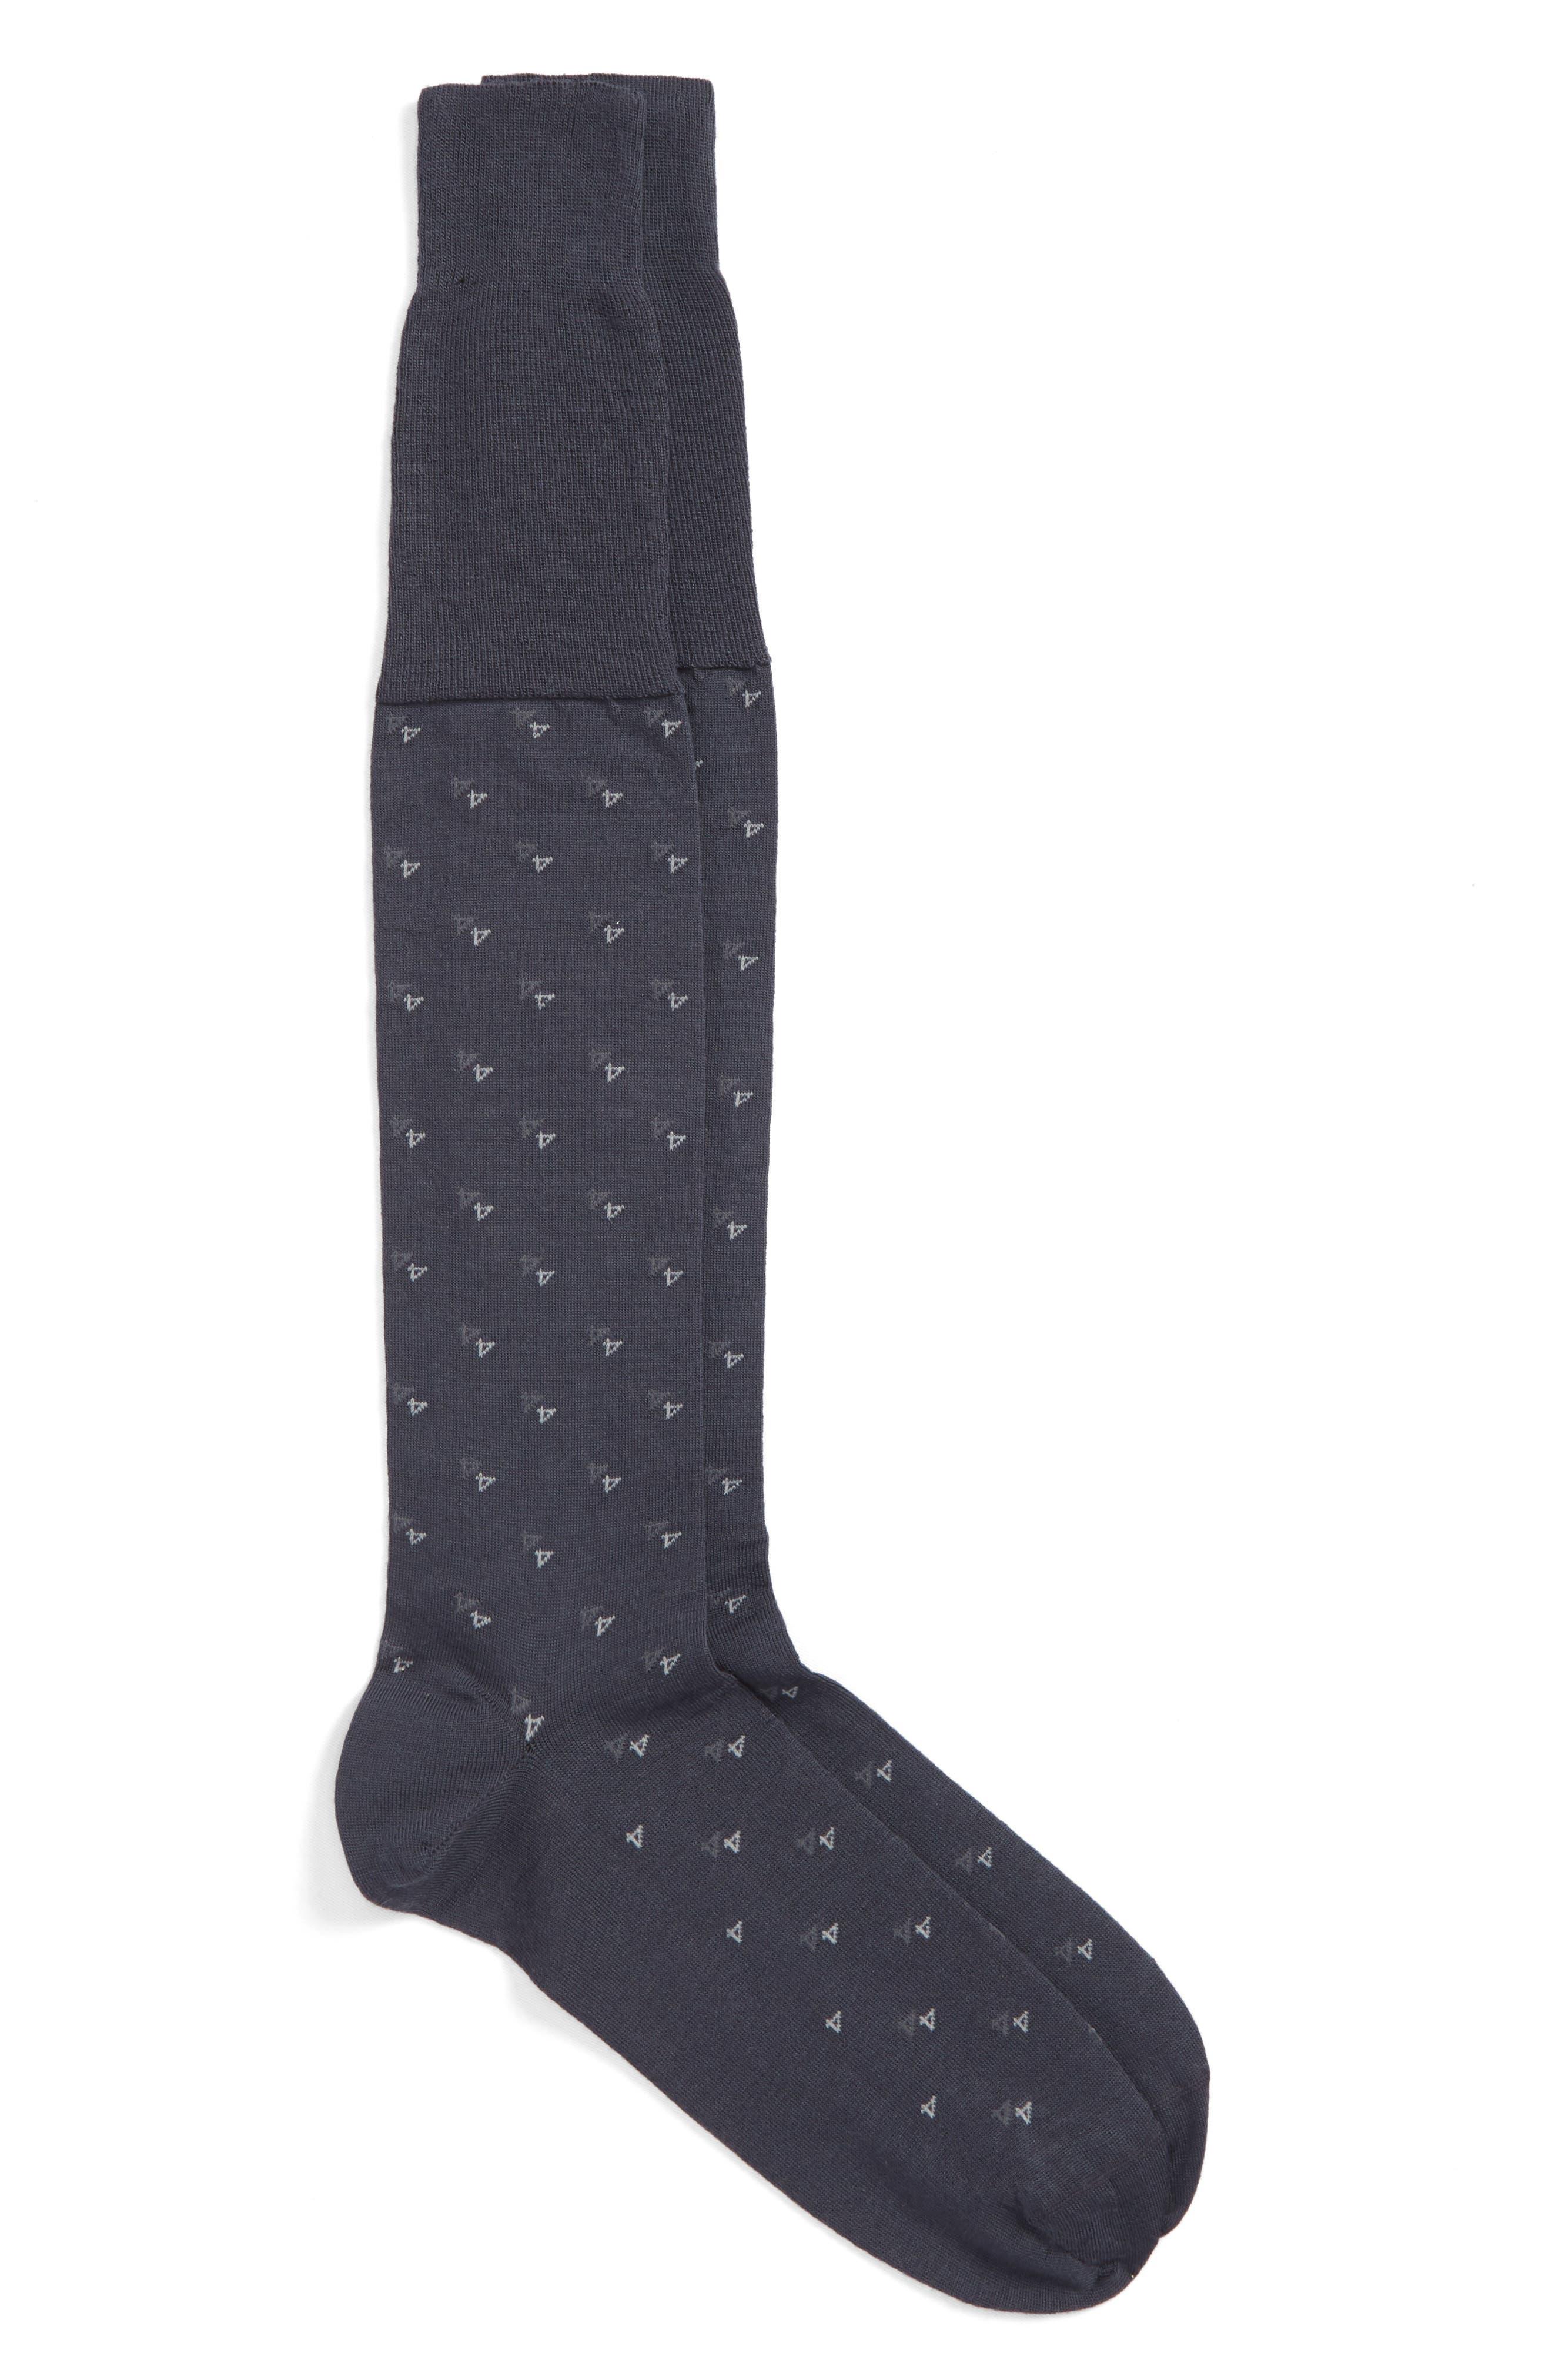 Geometric Over-the-Calf Socks,                             Main thumbnail 1, color,                             Navy Heather